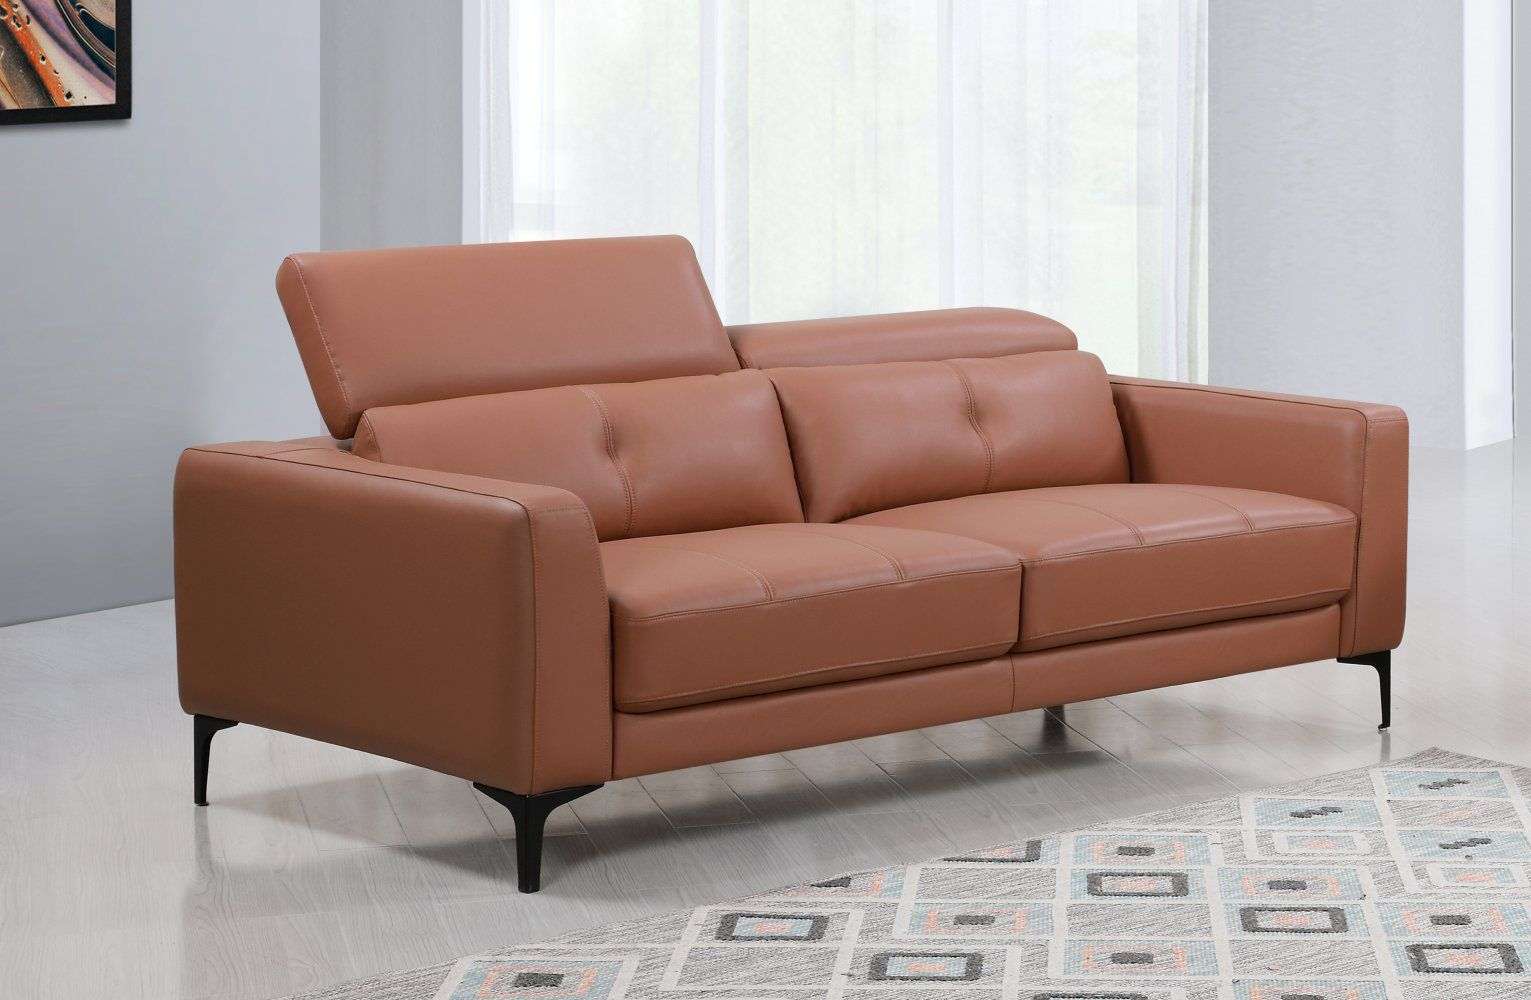 Echtleder Premium Couch Torino, 3-Sitz Sofa, Farbe: Oxford-braun